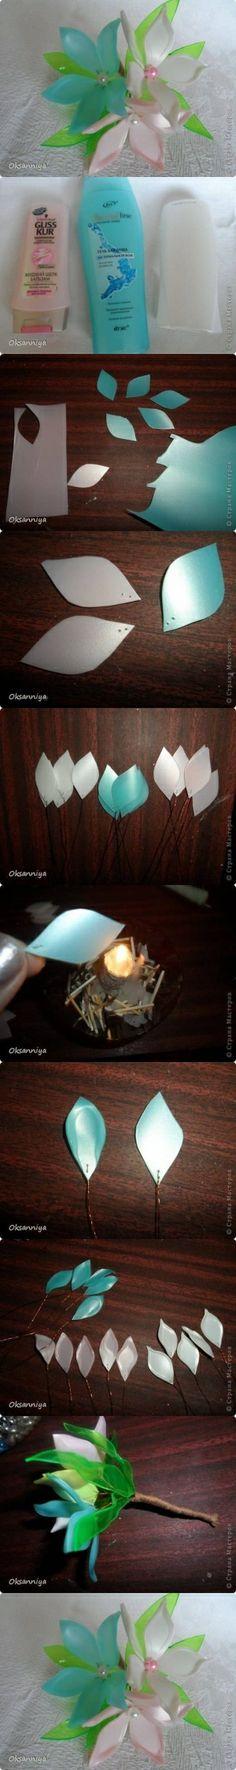 DIY Plastic Bottle Flower Bunch DIY Plastic Bottle Flower Bunch by diyforever